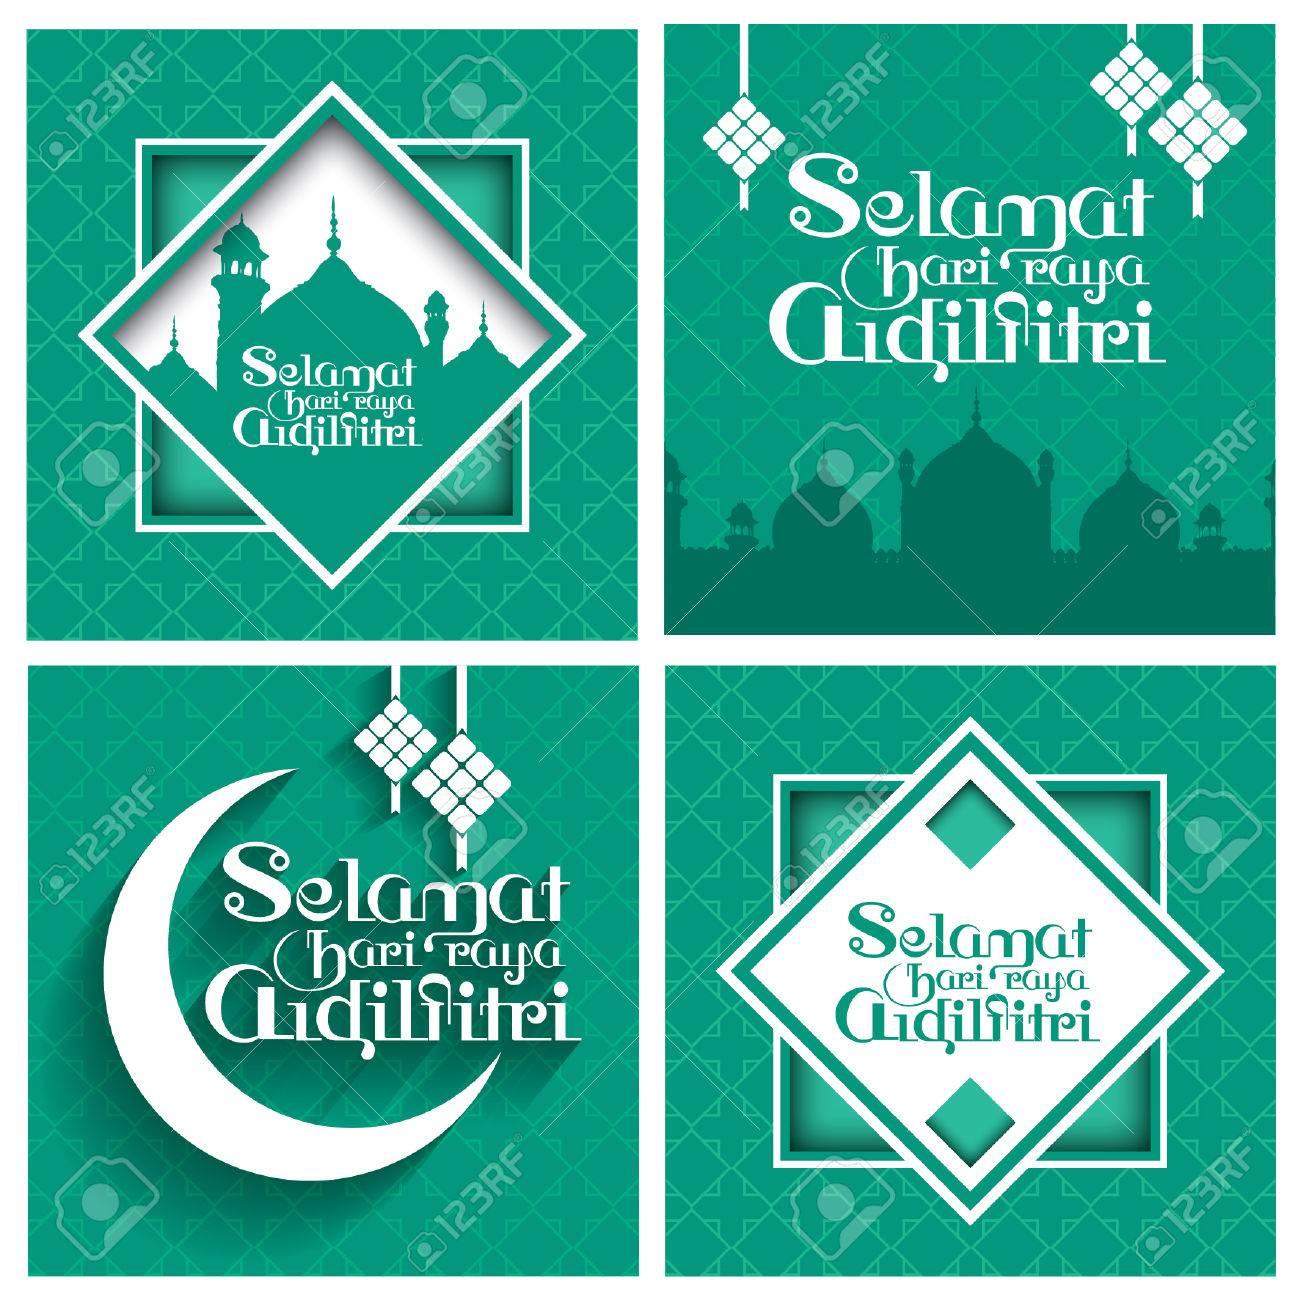 4 Set of Selamat Hari Raya Aidilfitri Vector Design (Translation: Celebration of Breaking Fast) - 77669929